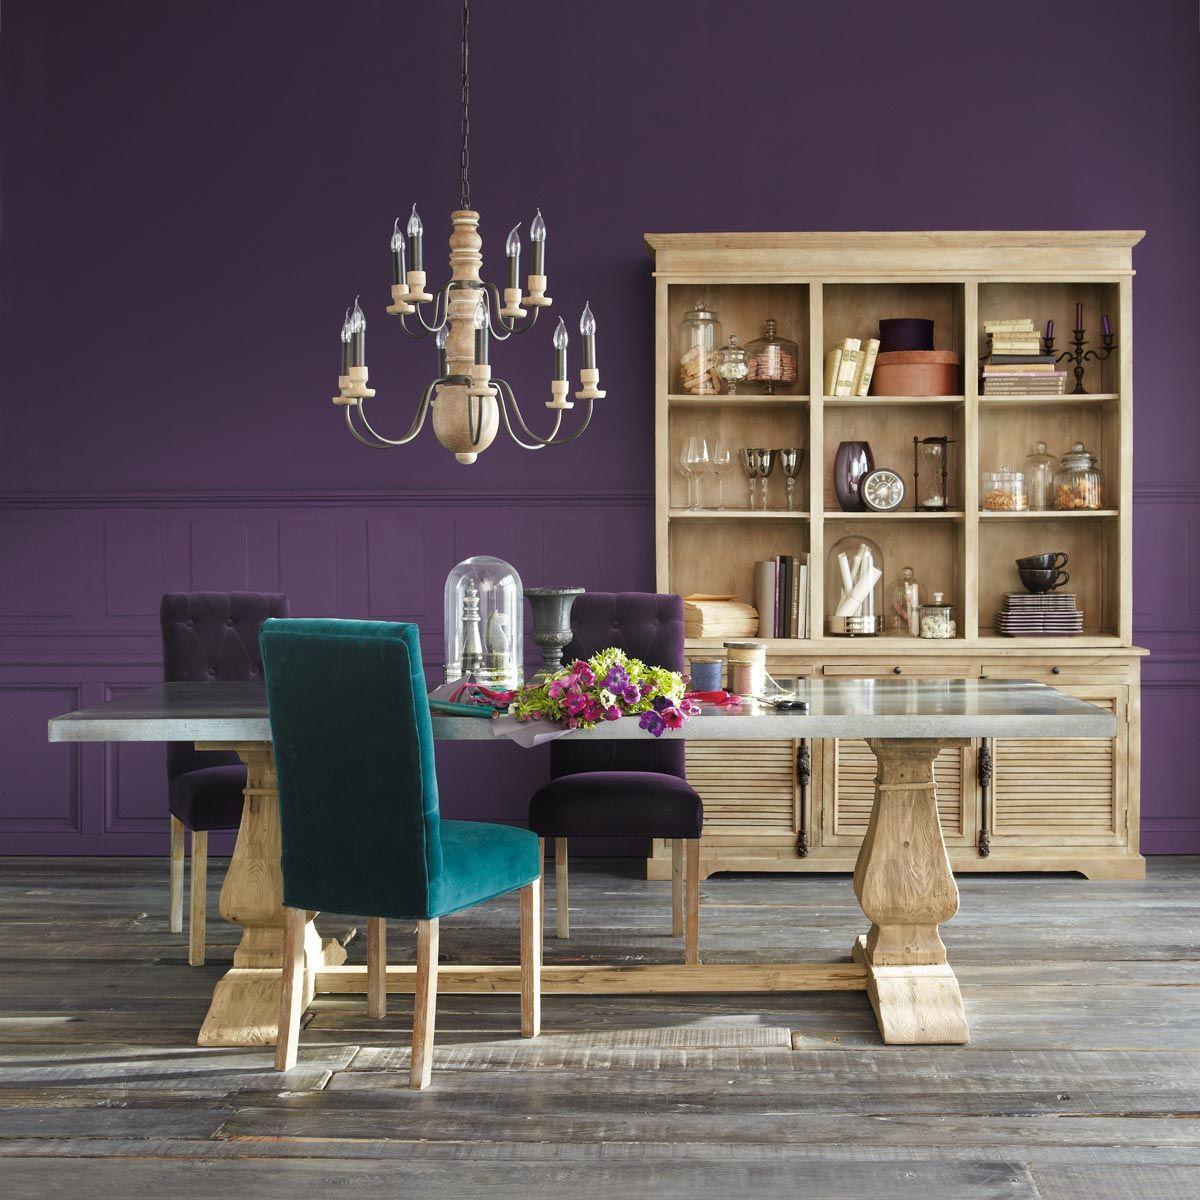 chaise capitonn e velours aubergine elizabeth chaises pinterest chaise capitonn e velours. Black Bedroom Furniture Sets. Home Design Ideas